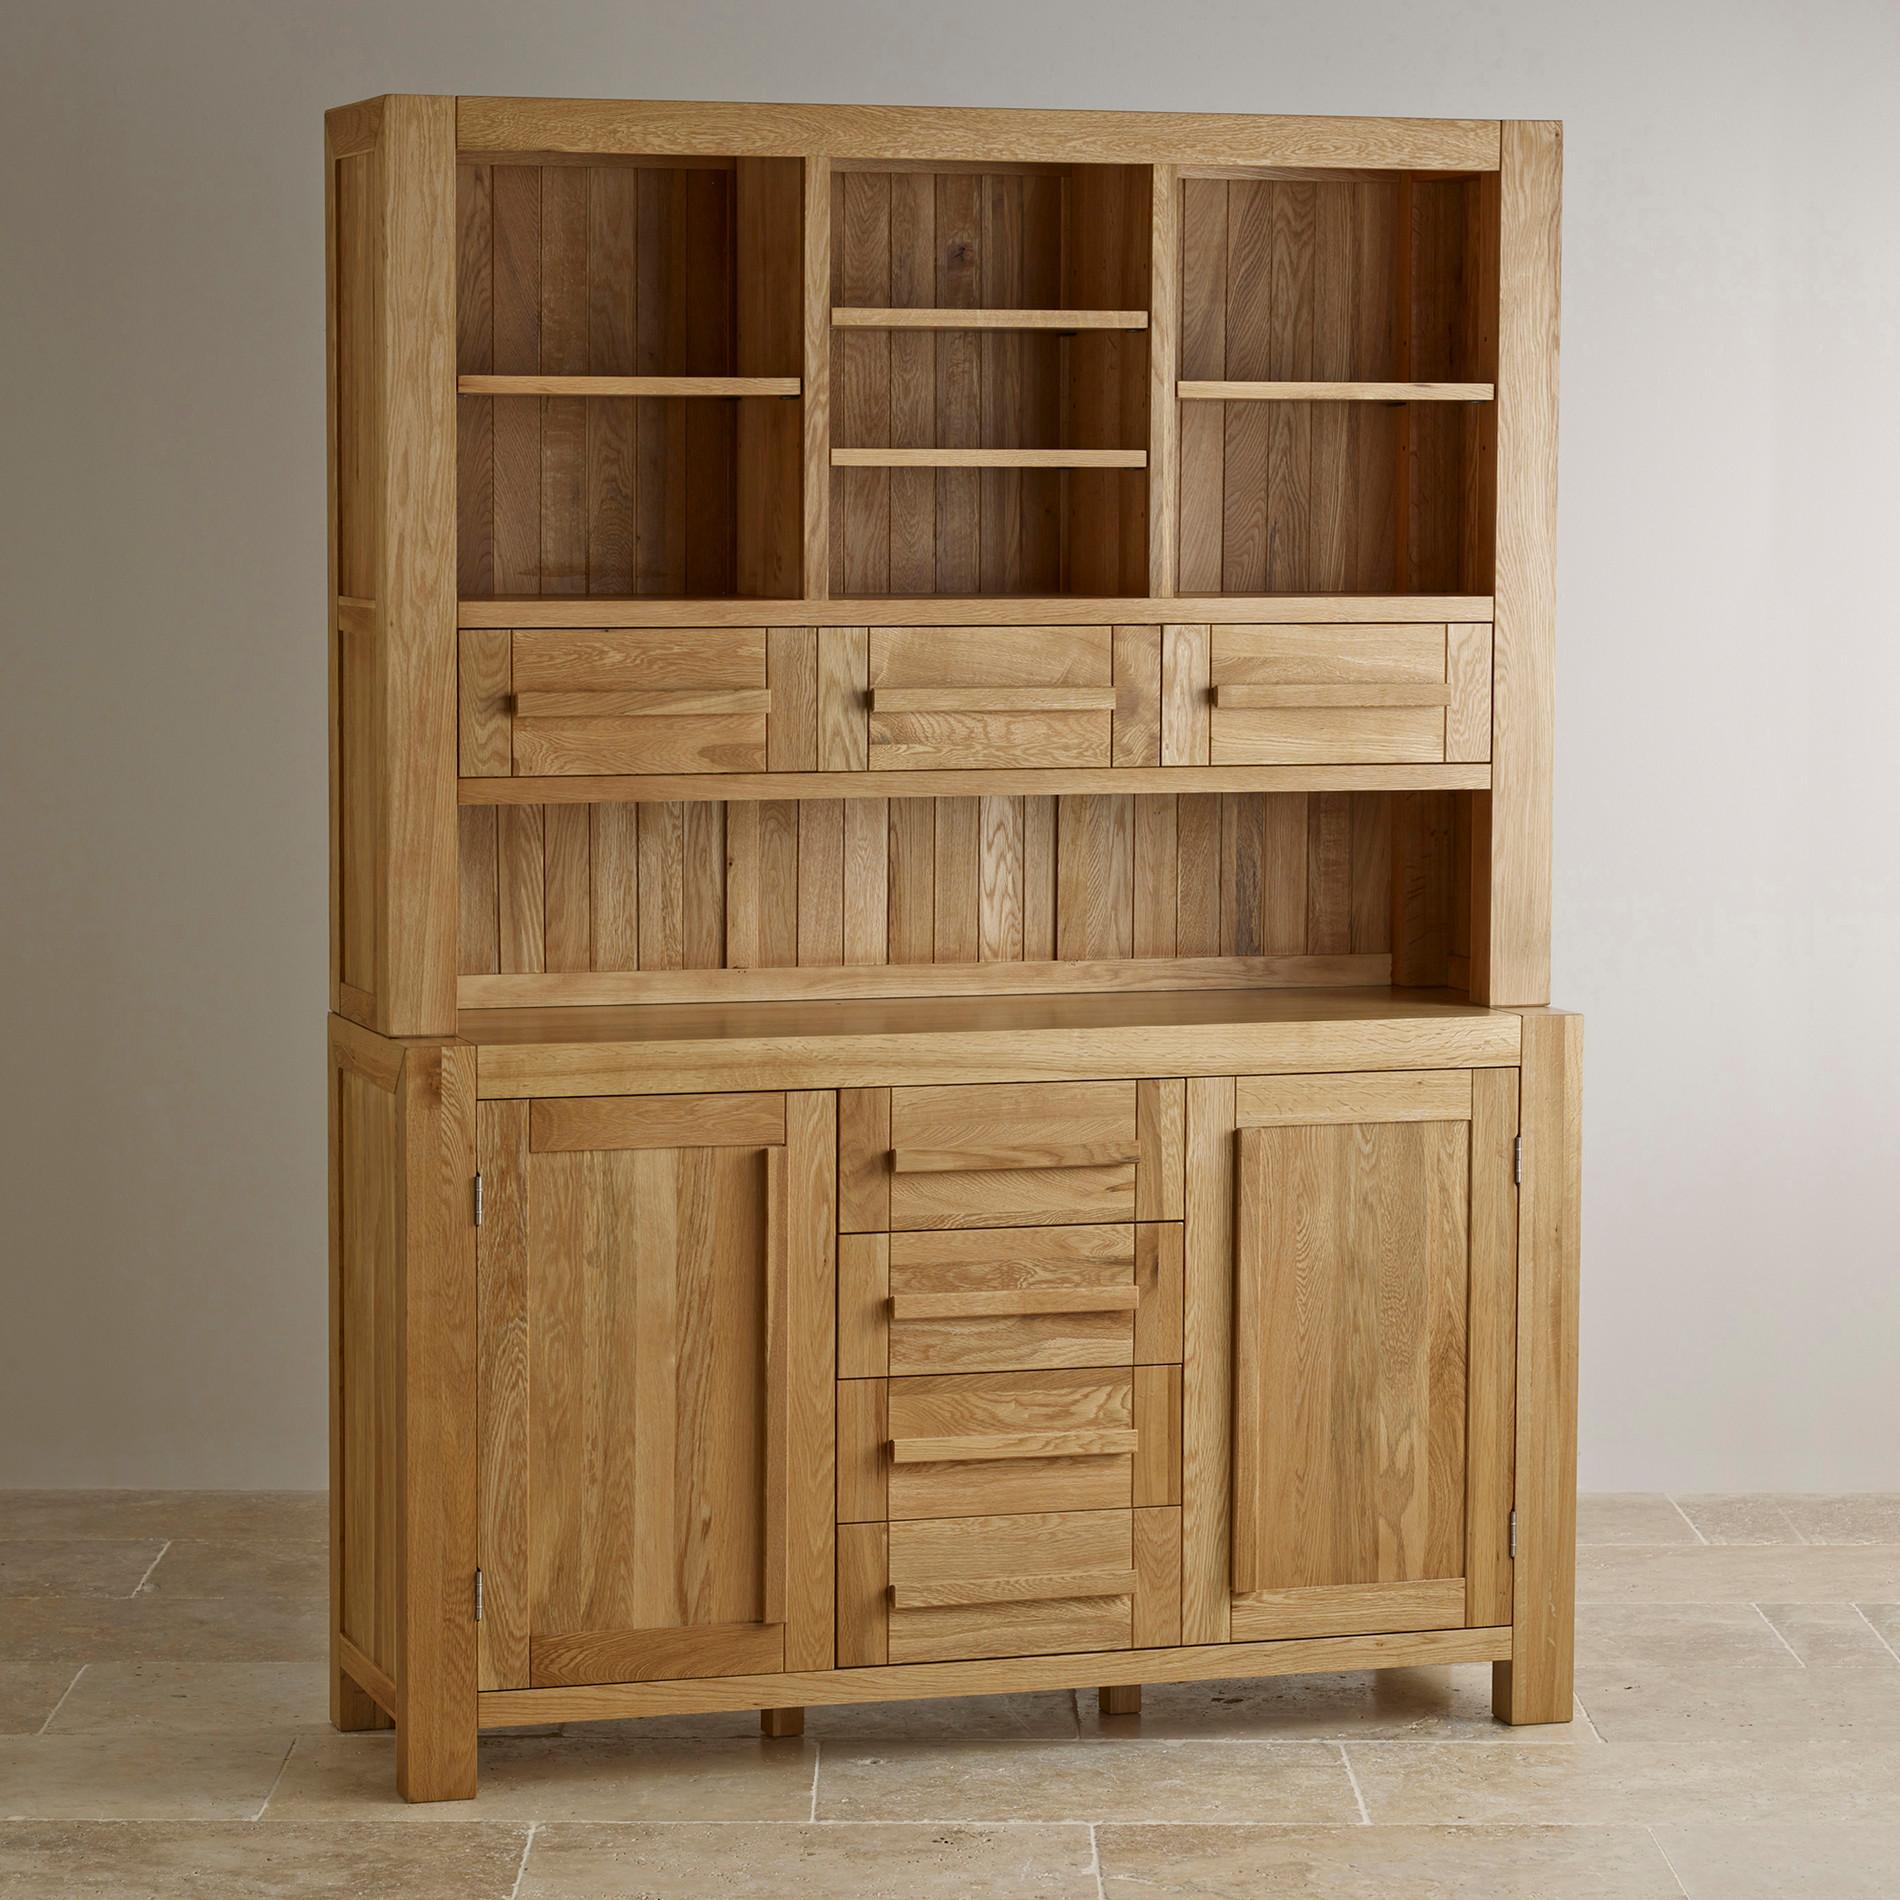 Welsh dresser from an era gone by